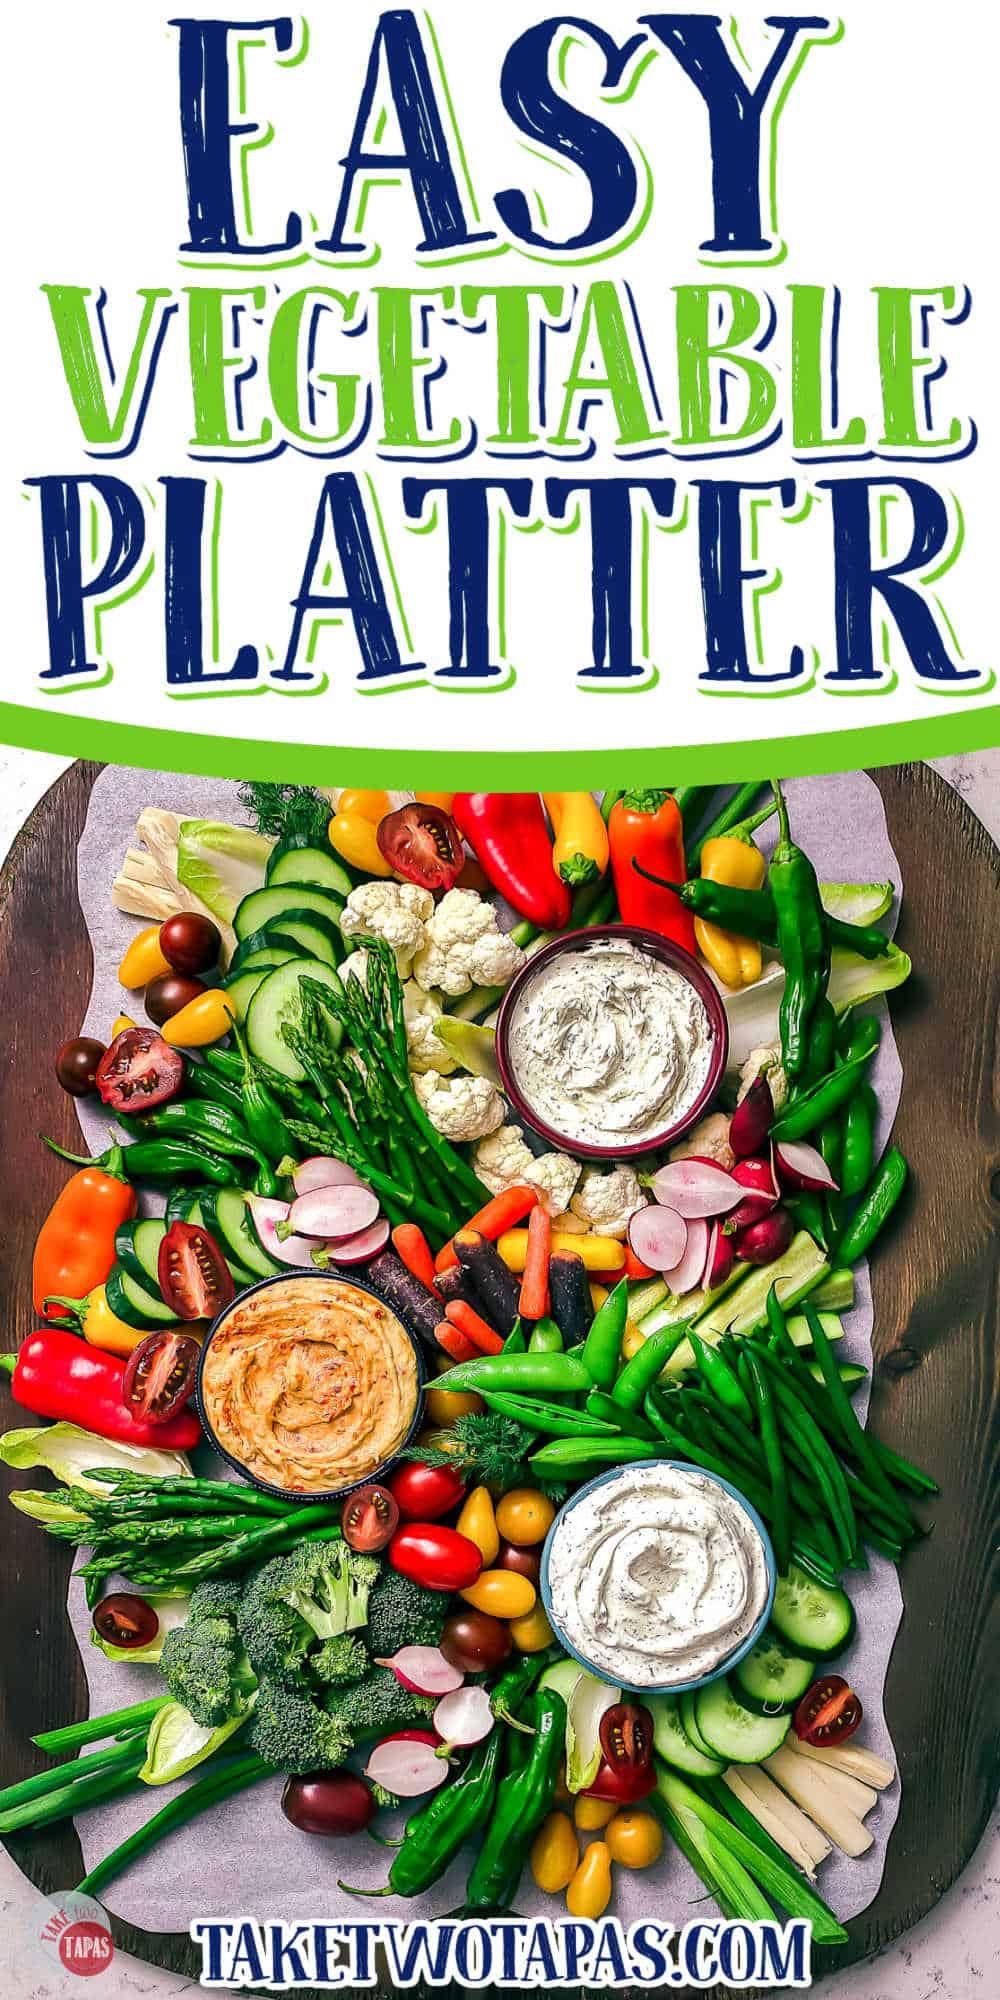 Pinterest image of a vegetable platter